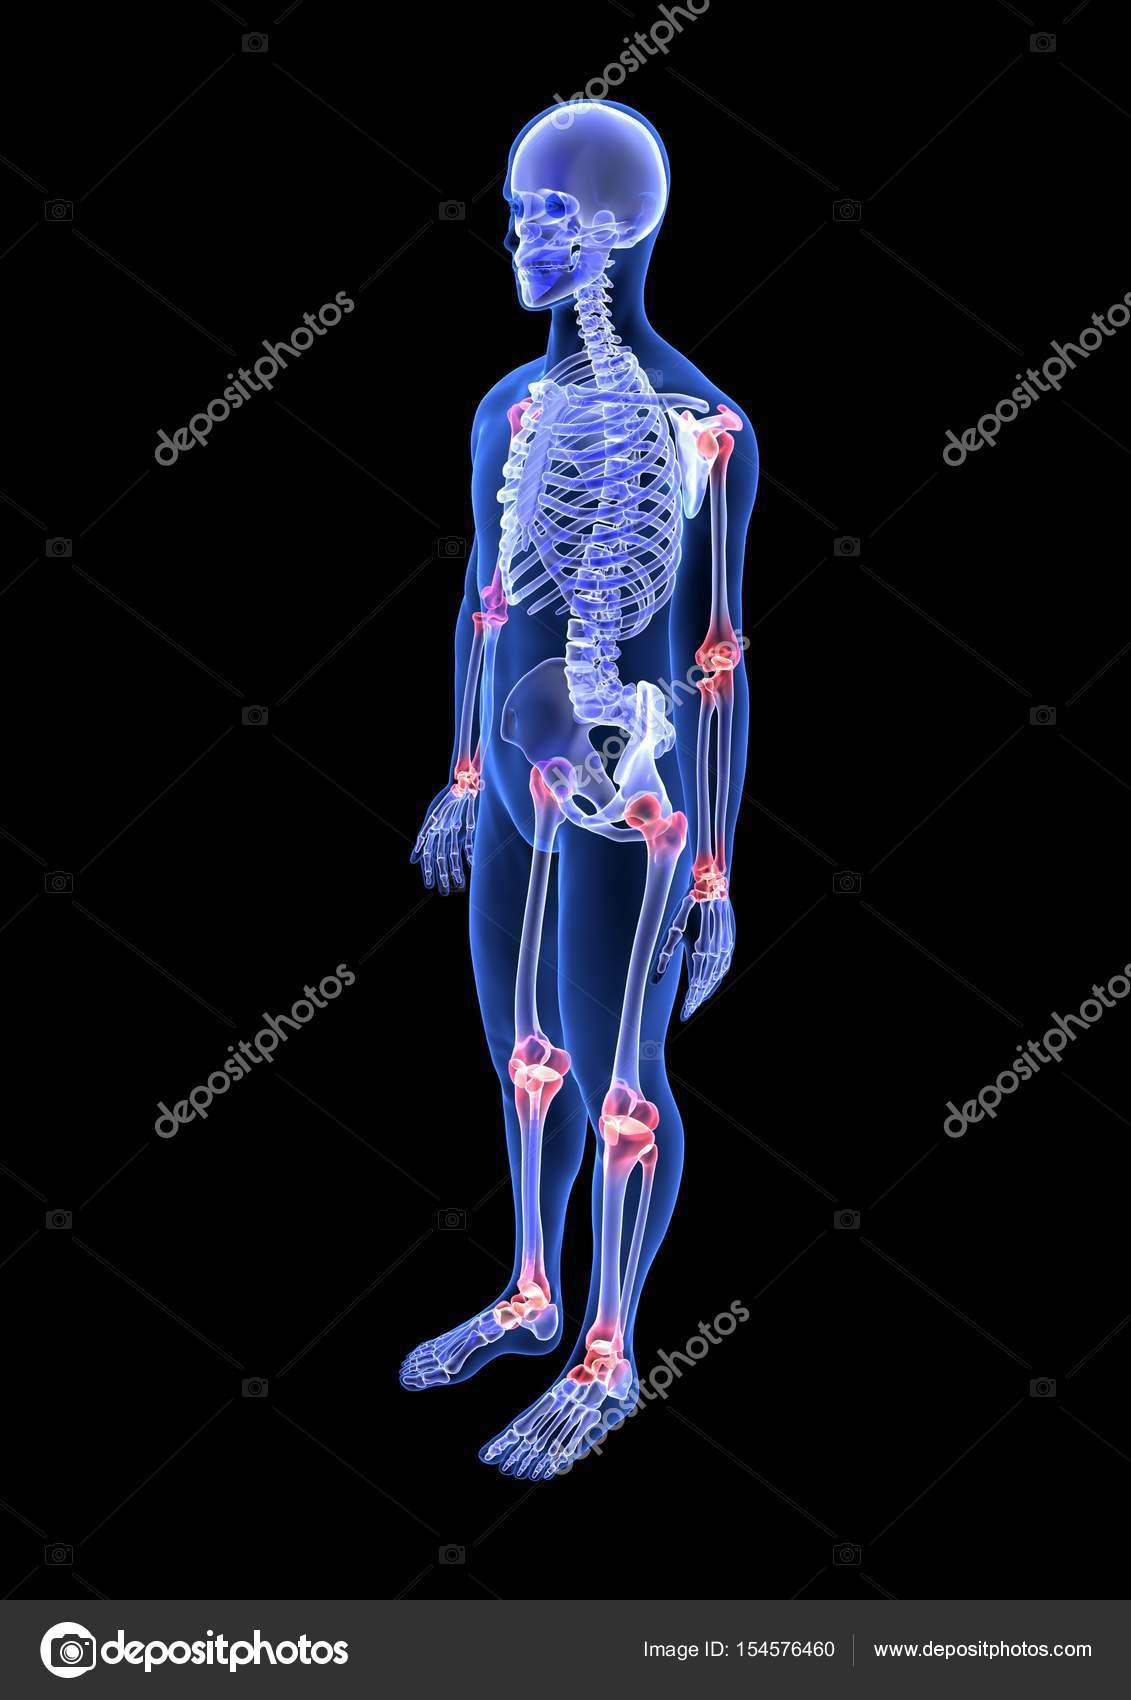 Gelenkschmerzen rasch behandeln, Chronifizierung verhindern